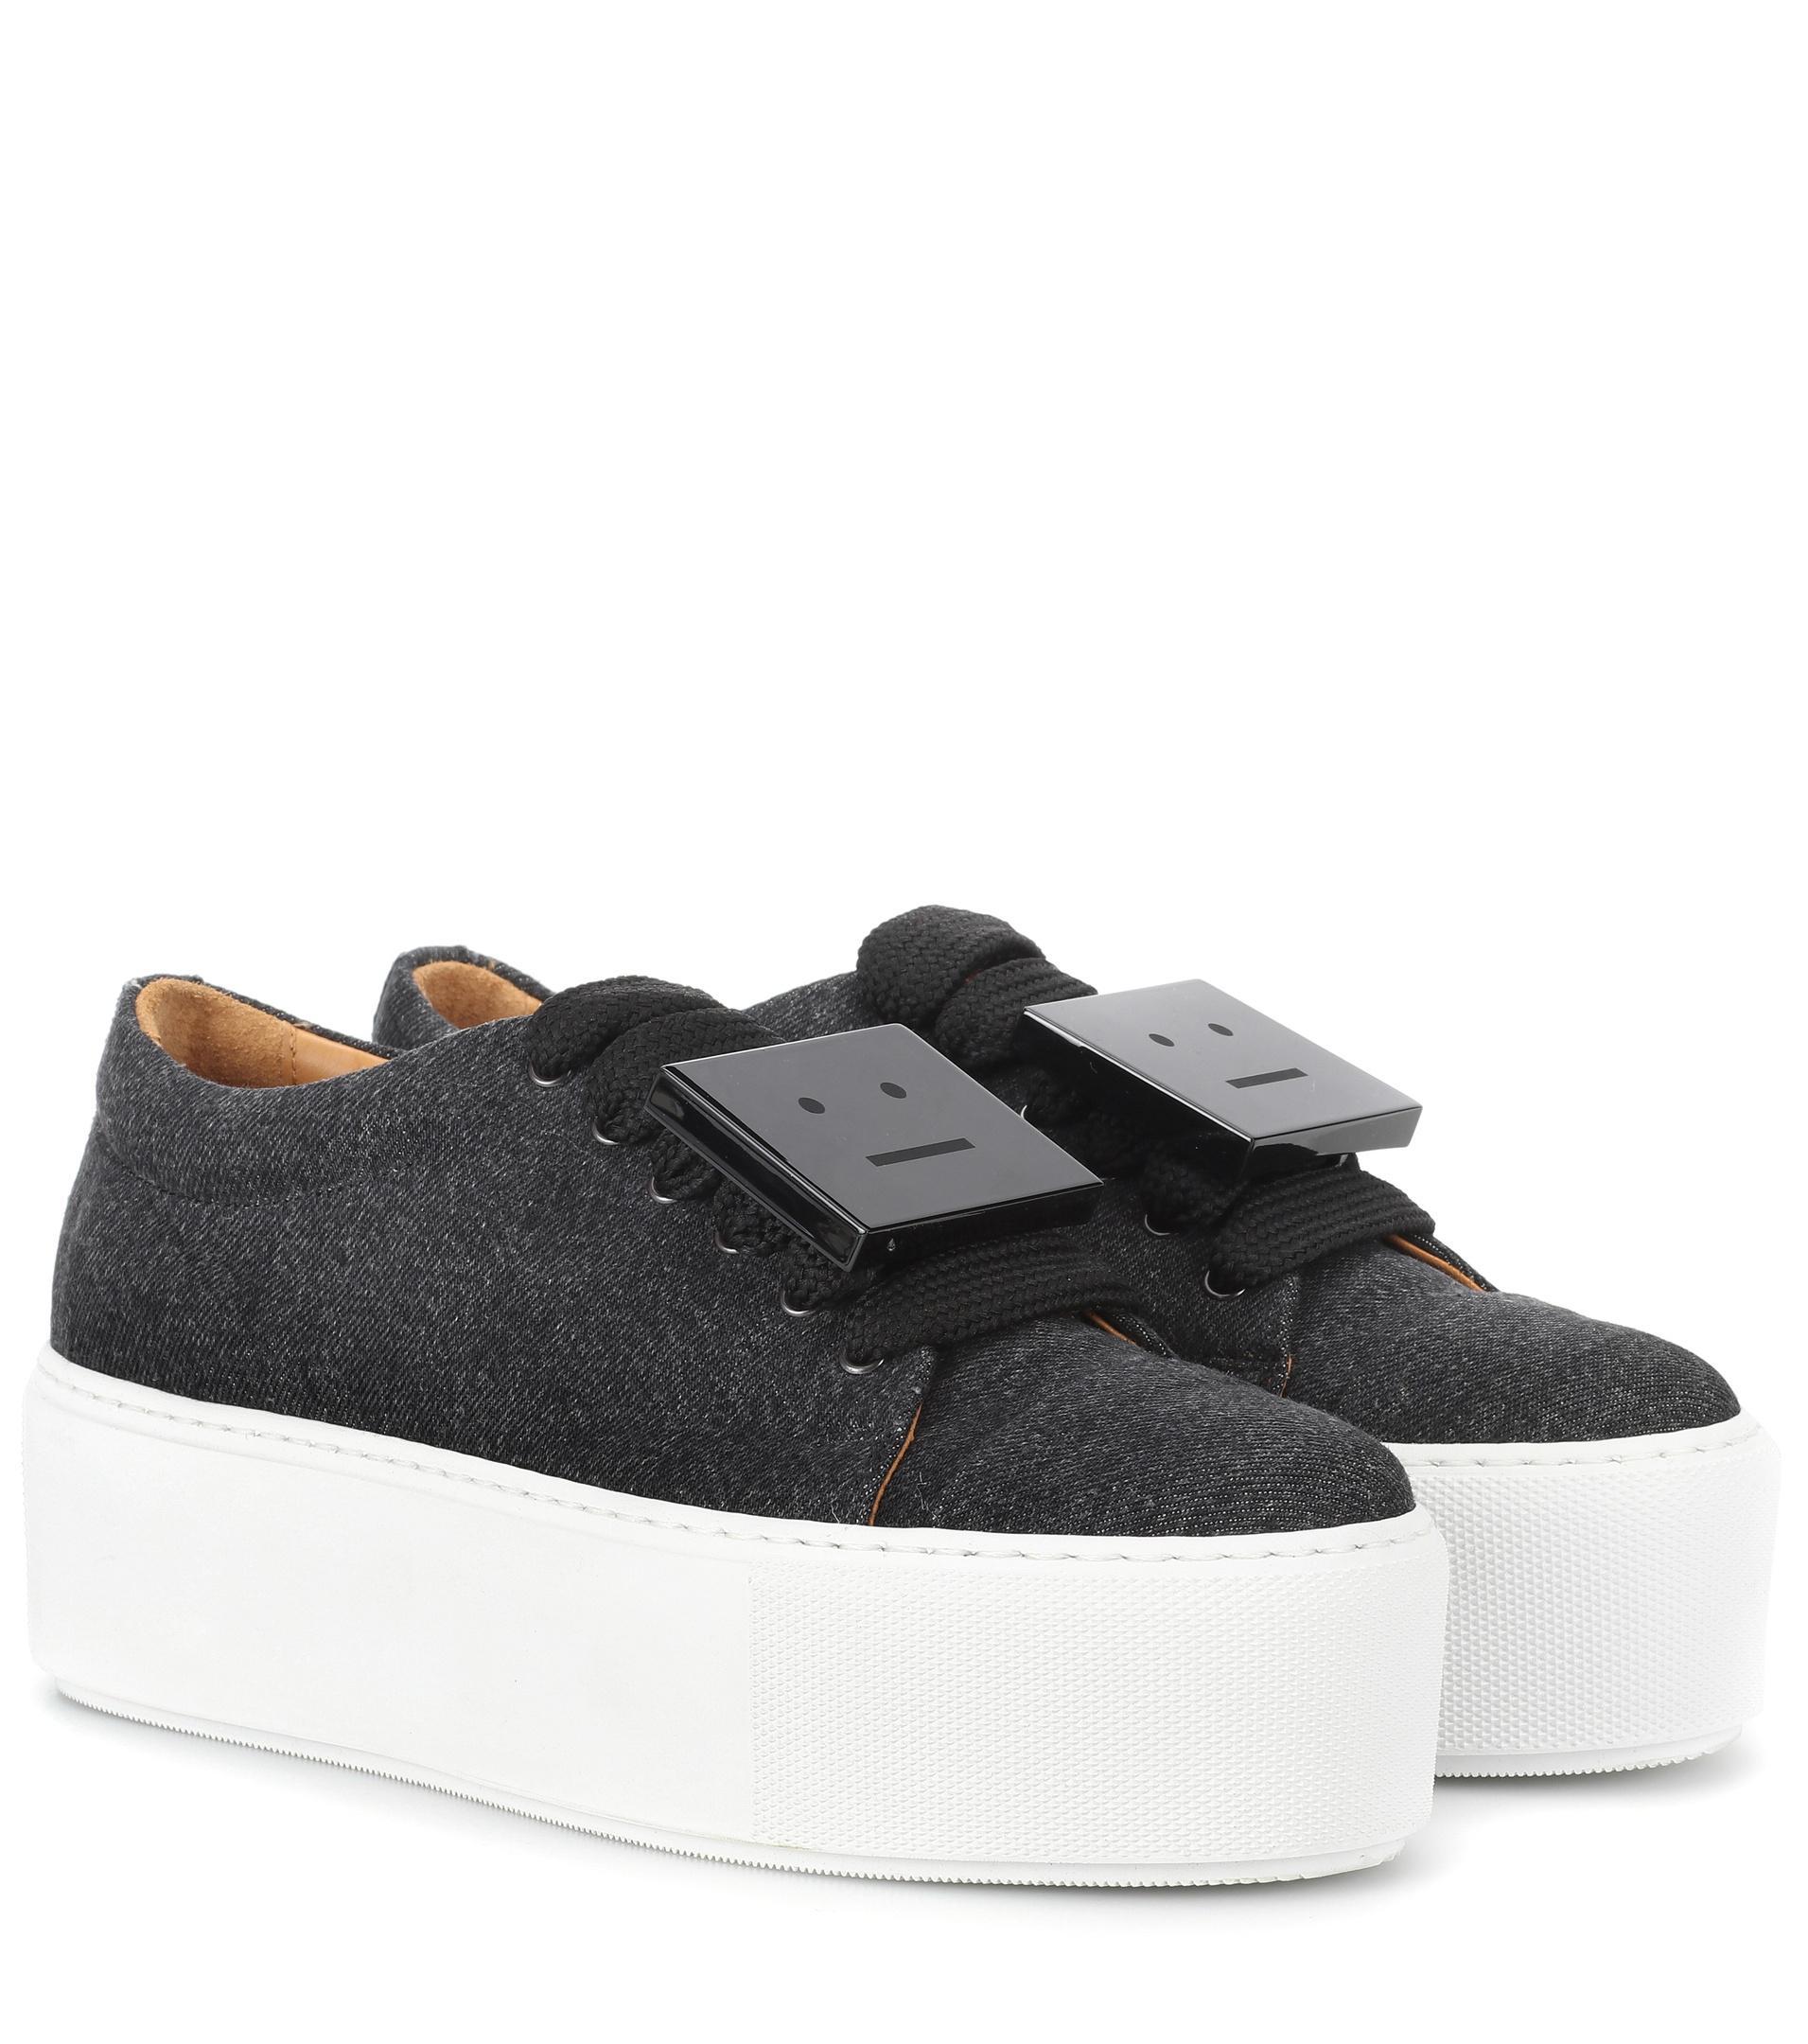 black Drihanna 55 washed denim sneakers Acne Studios h9f8U3kp2Z